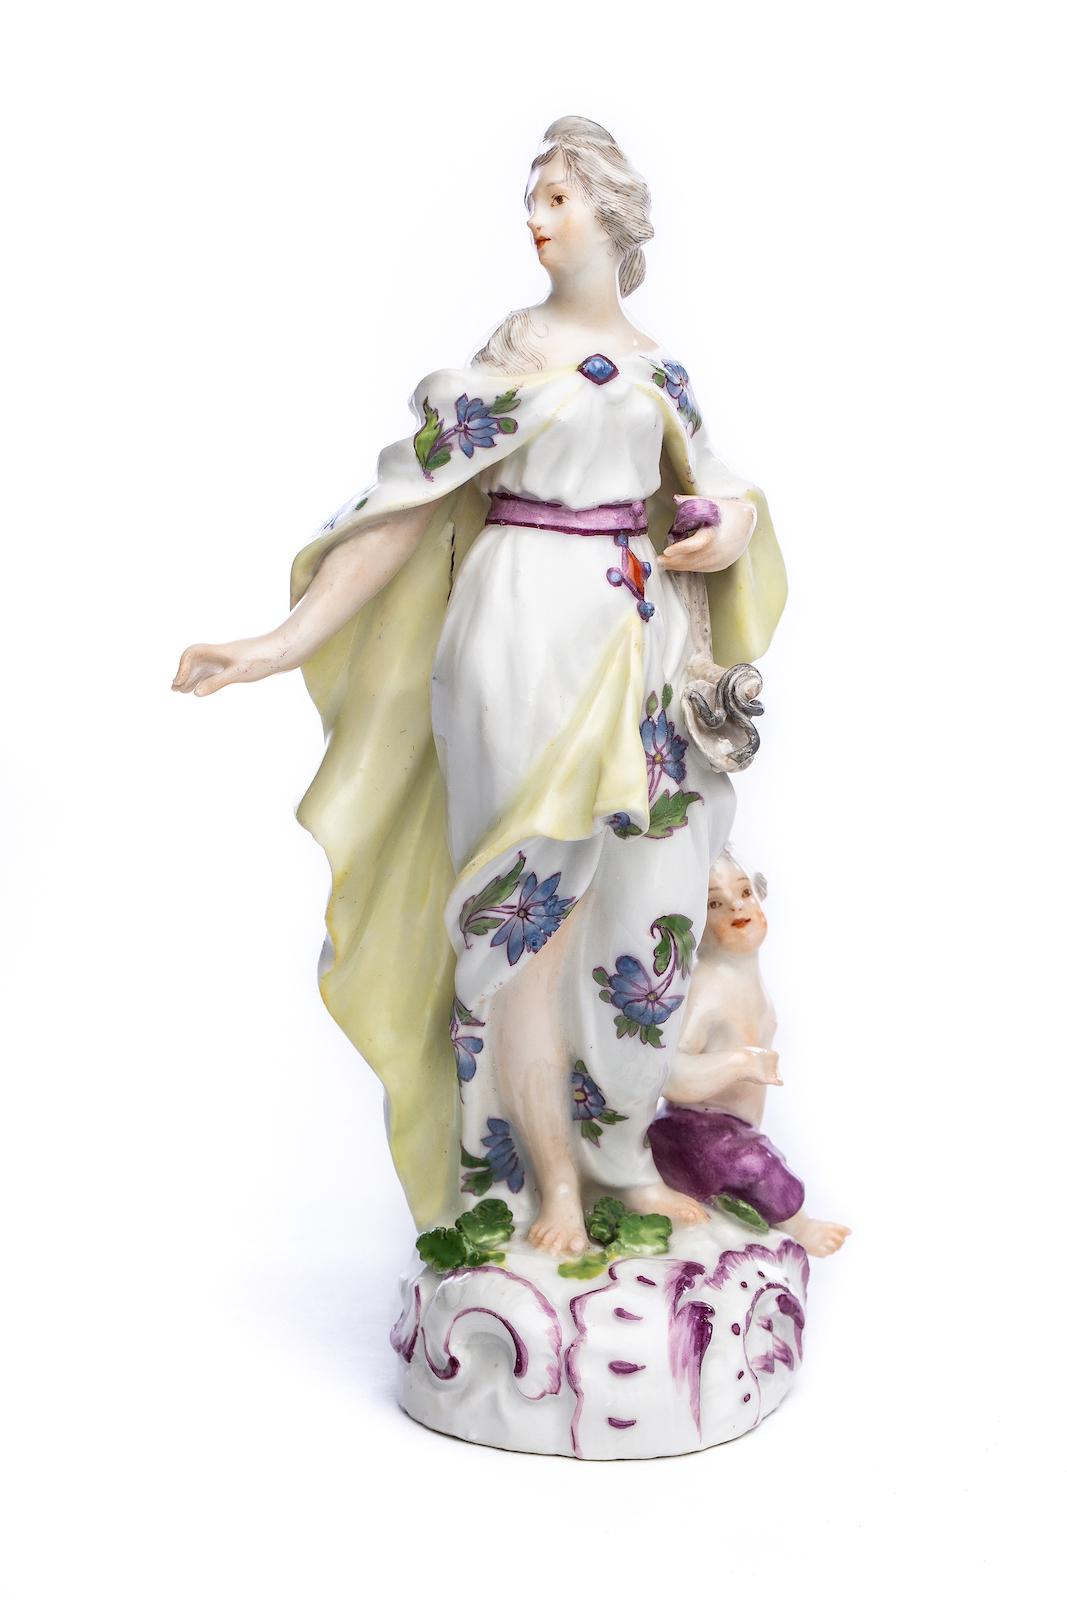 #177 Weibliche Porzellanfigur, Meissen 1752 | Figure of a young woman, Meissen 1752 Image